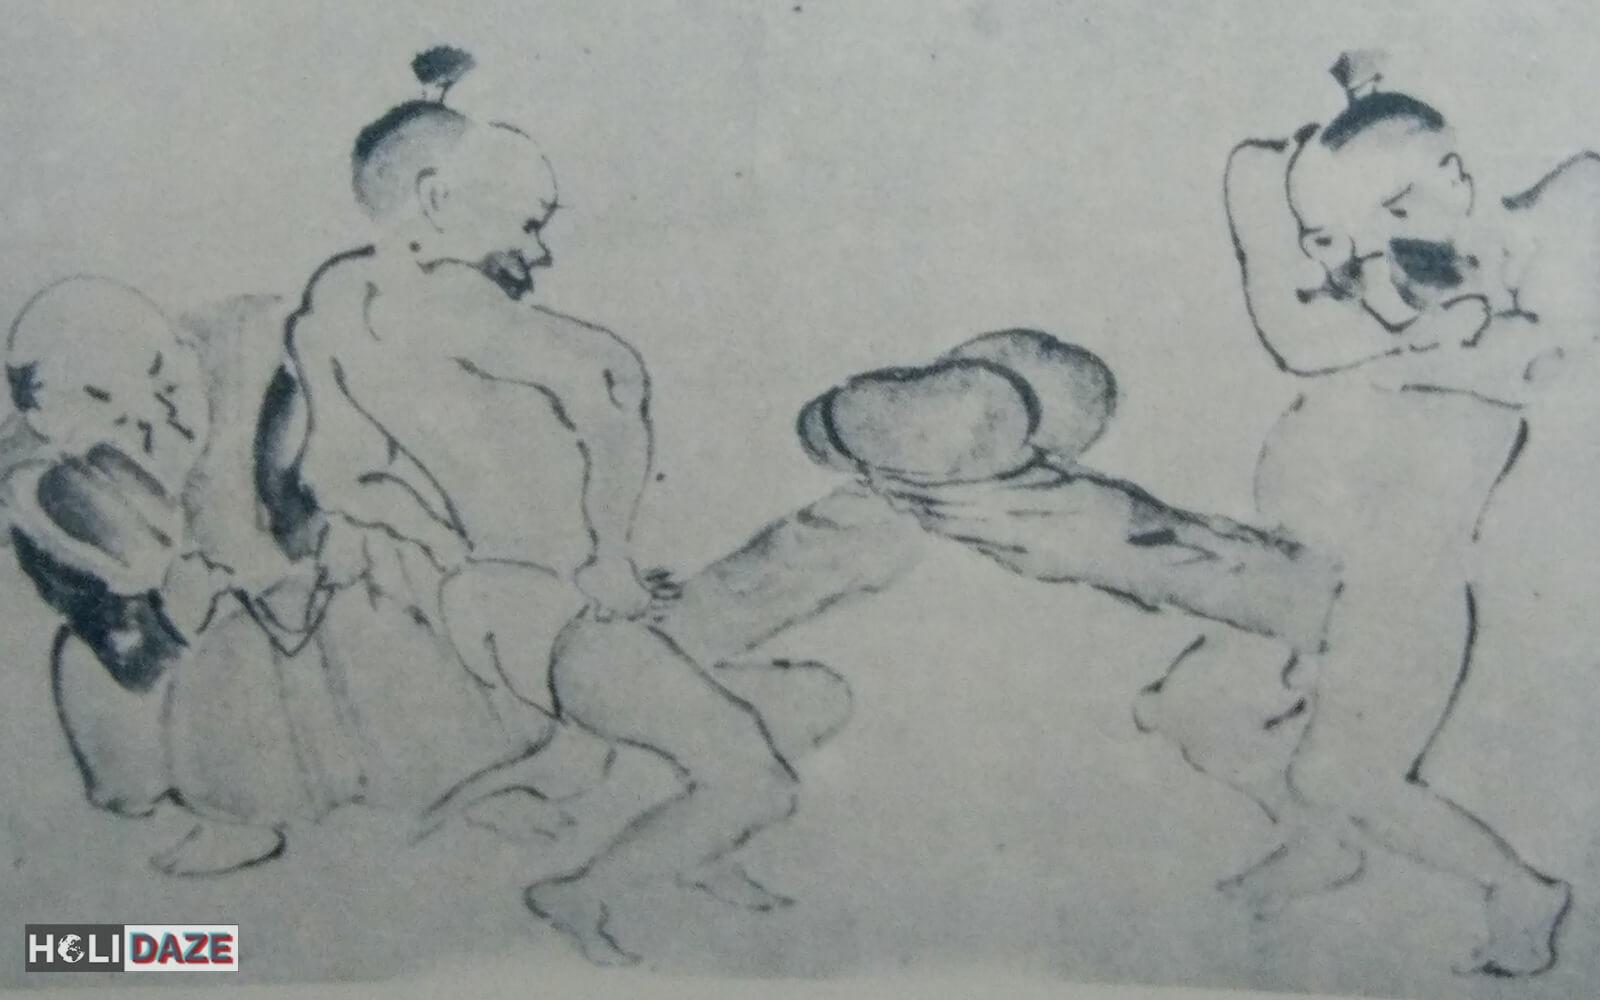 Mildly disturbing scene found at the Sex Museum in Gyongju, Korea